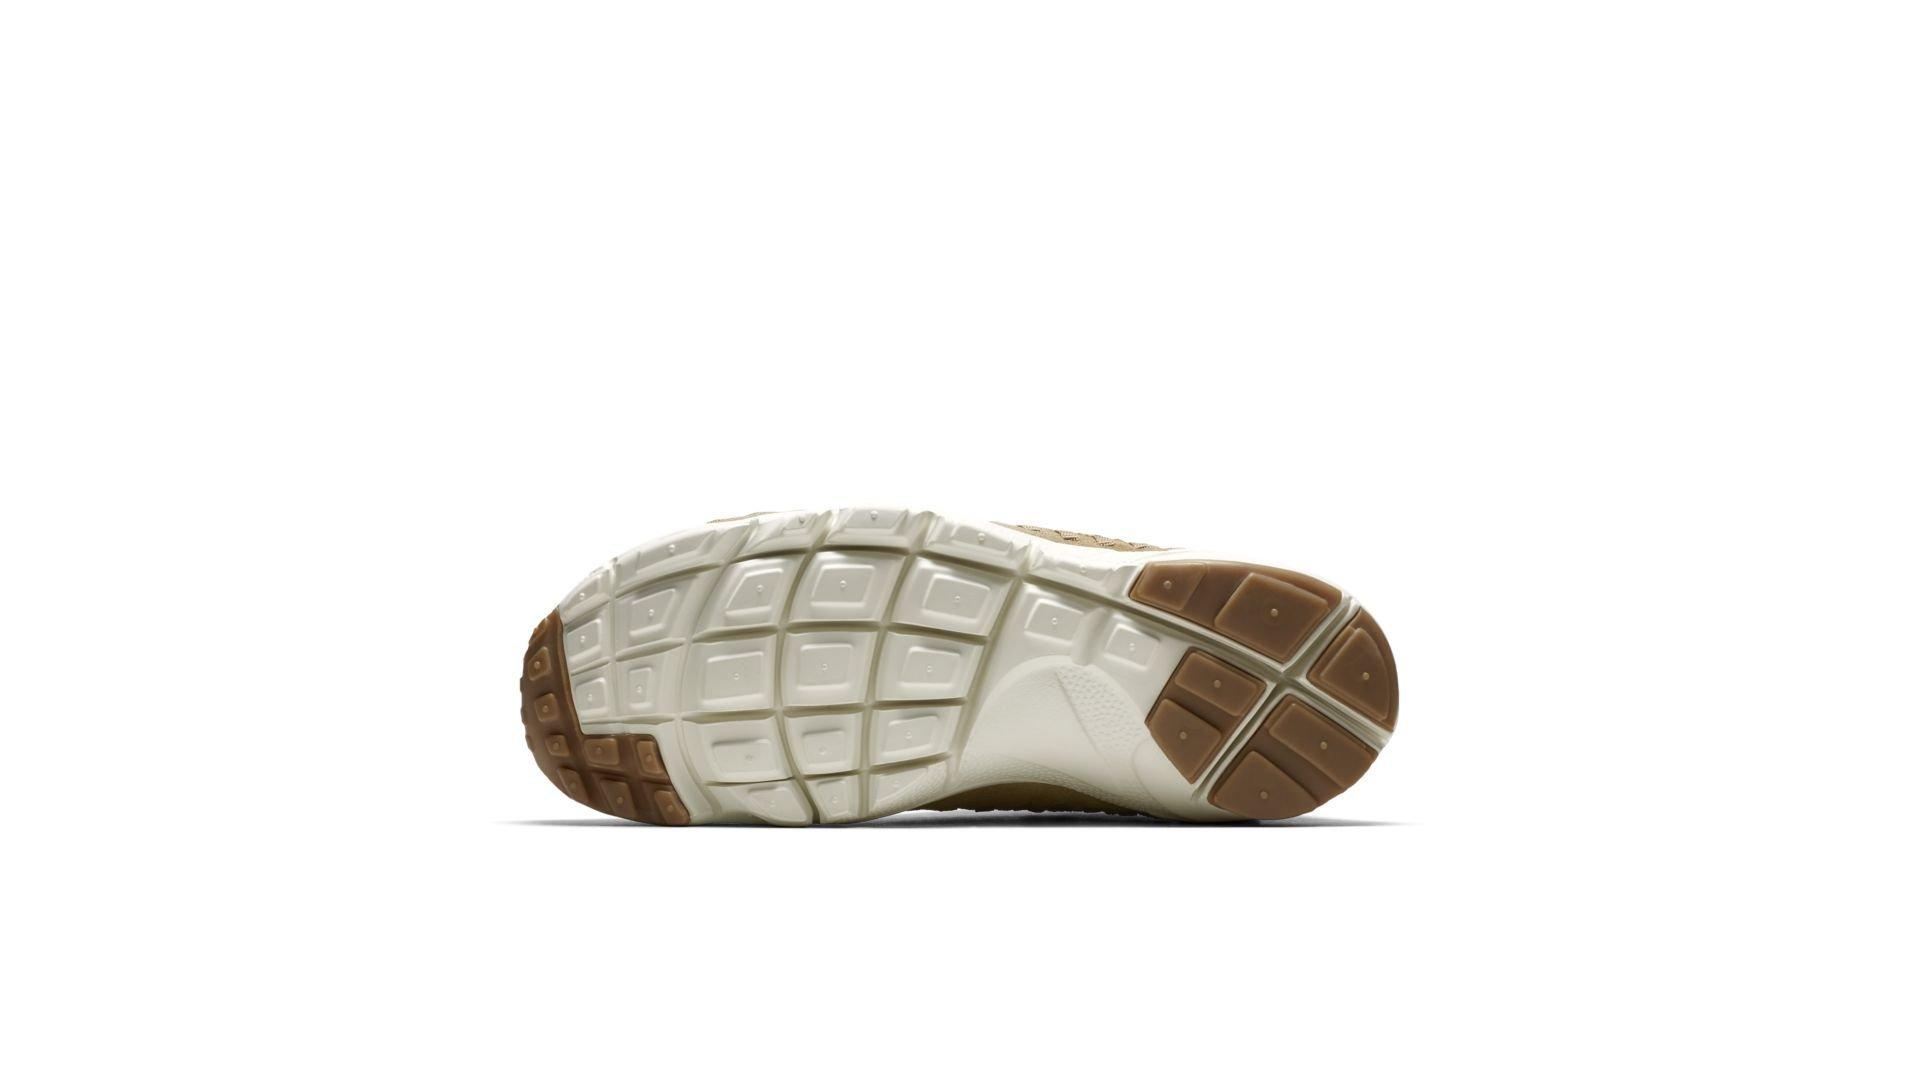 Nike Air Footscape Woven Chukka 443686-205